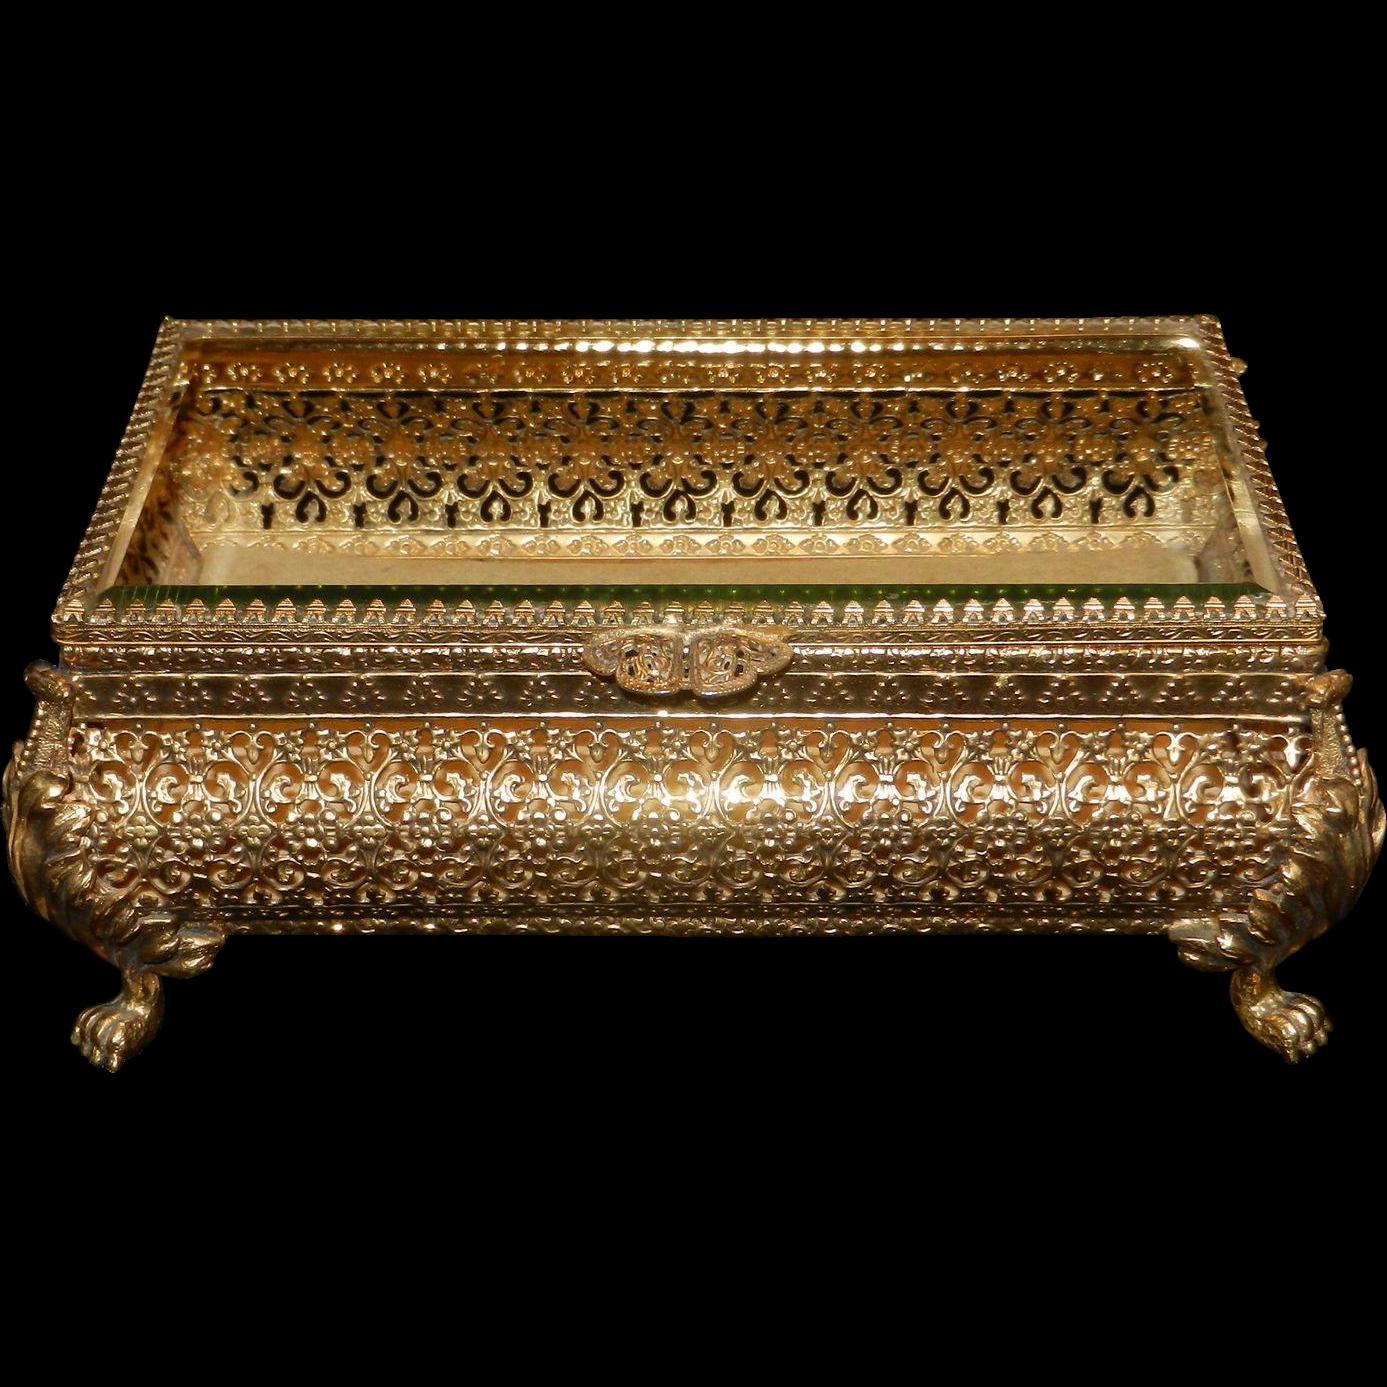 Vintage Ormolu 22 kt. Gold Overlay Beveled Glass Jewelry Casket